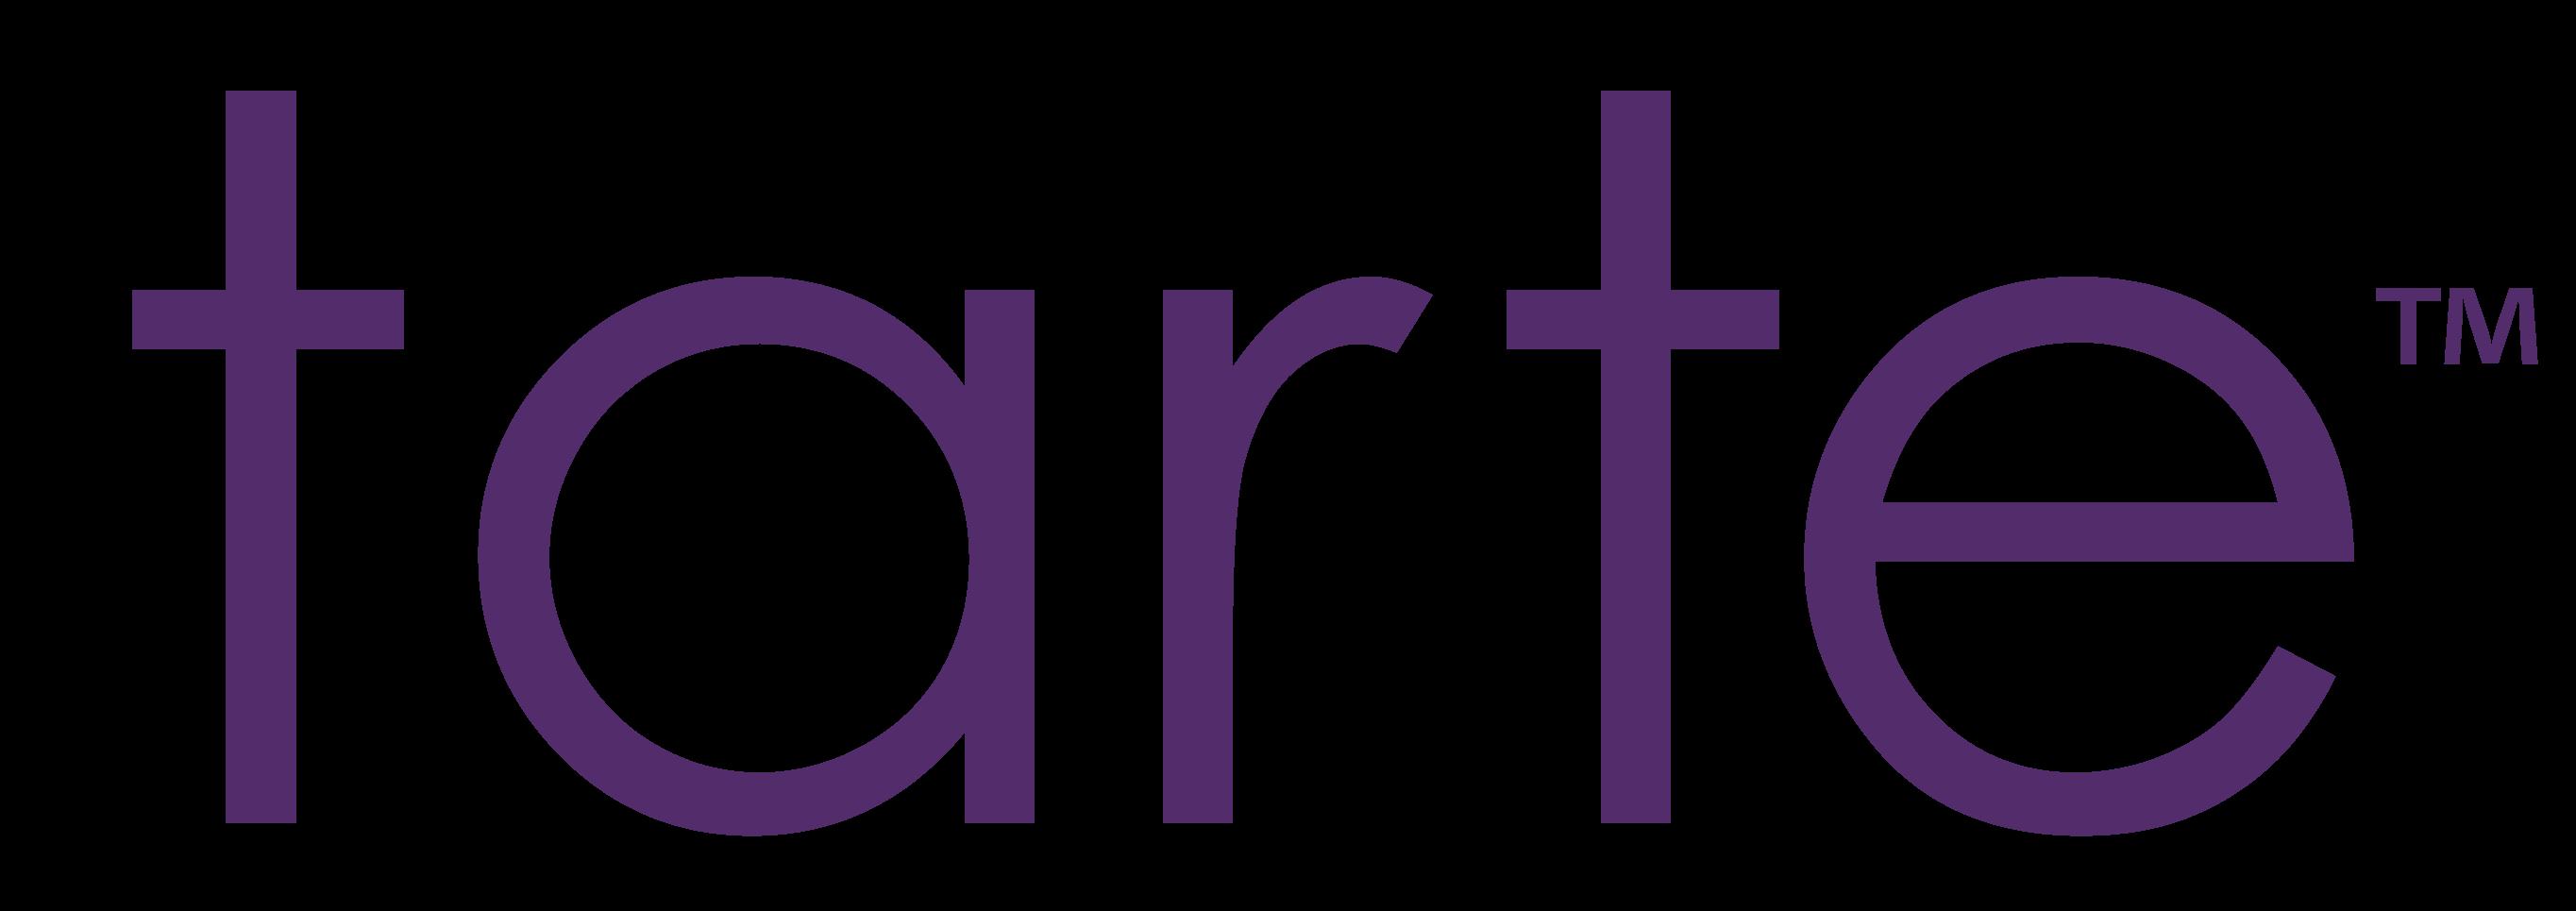 tarte_logo_purple (2)-01